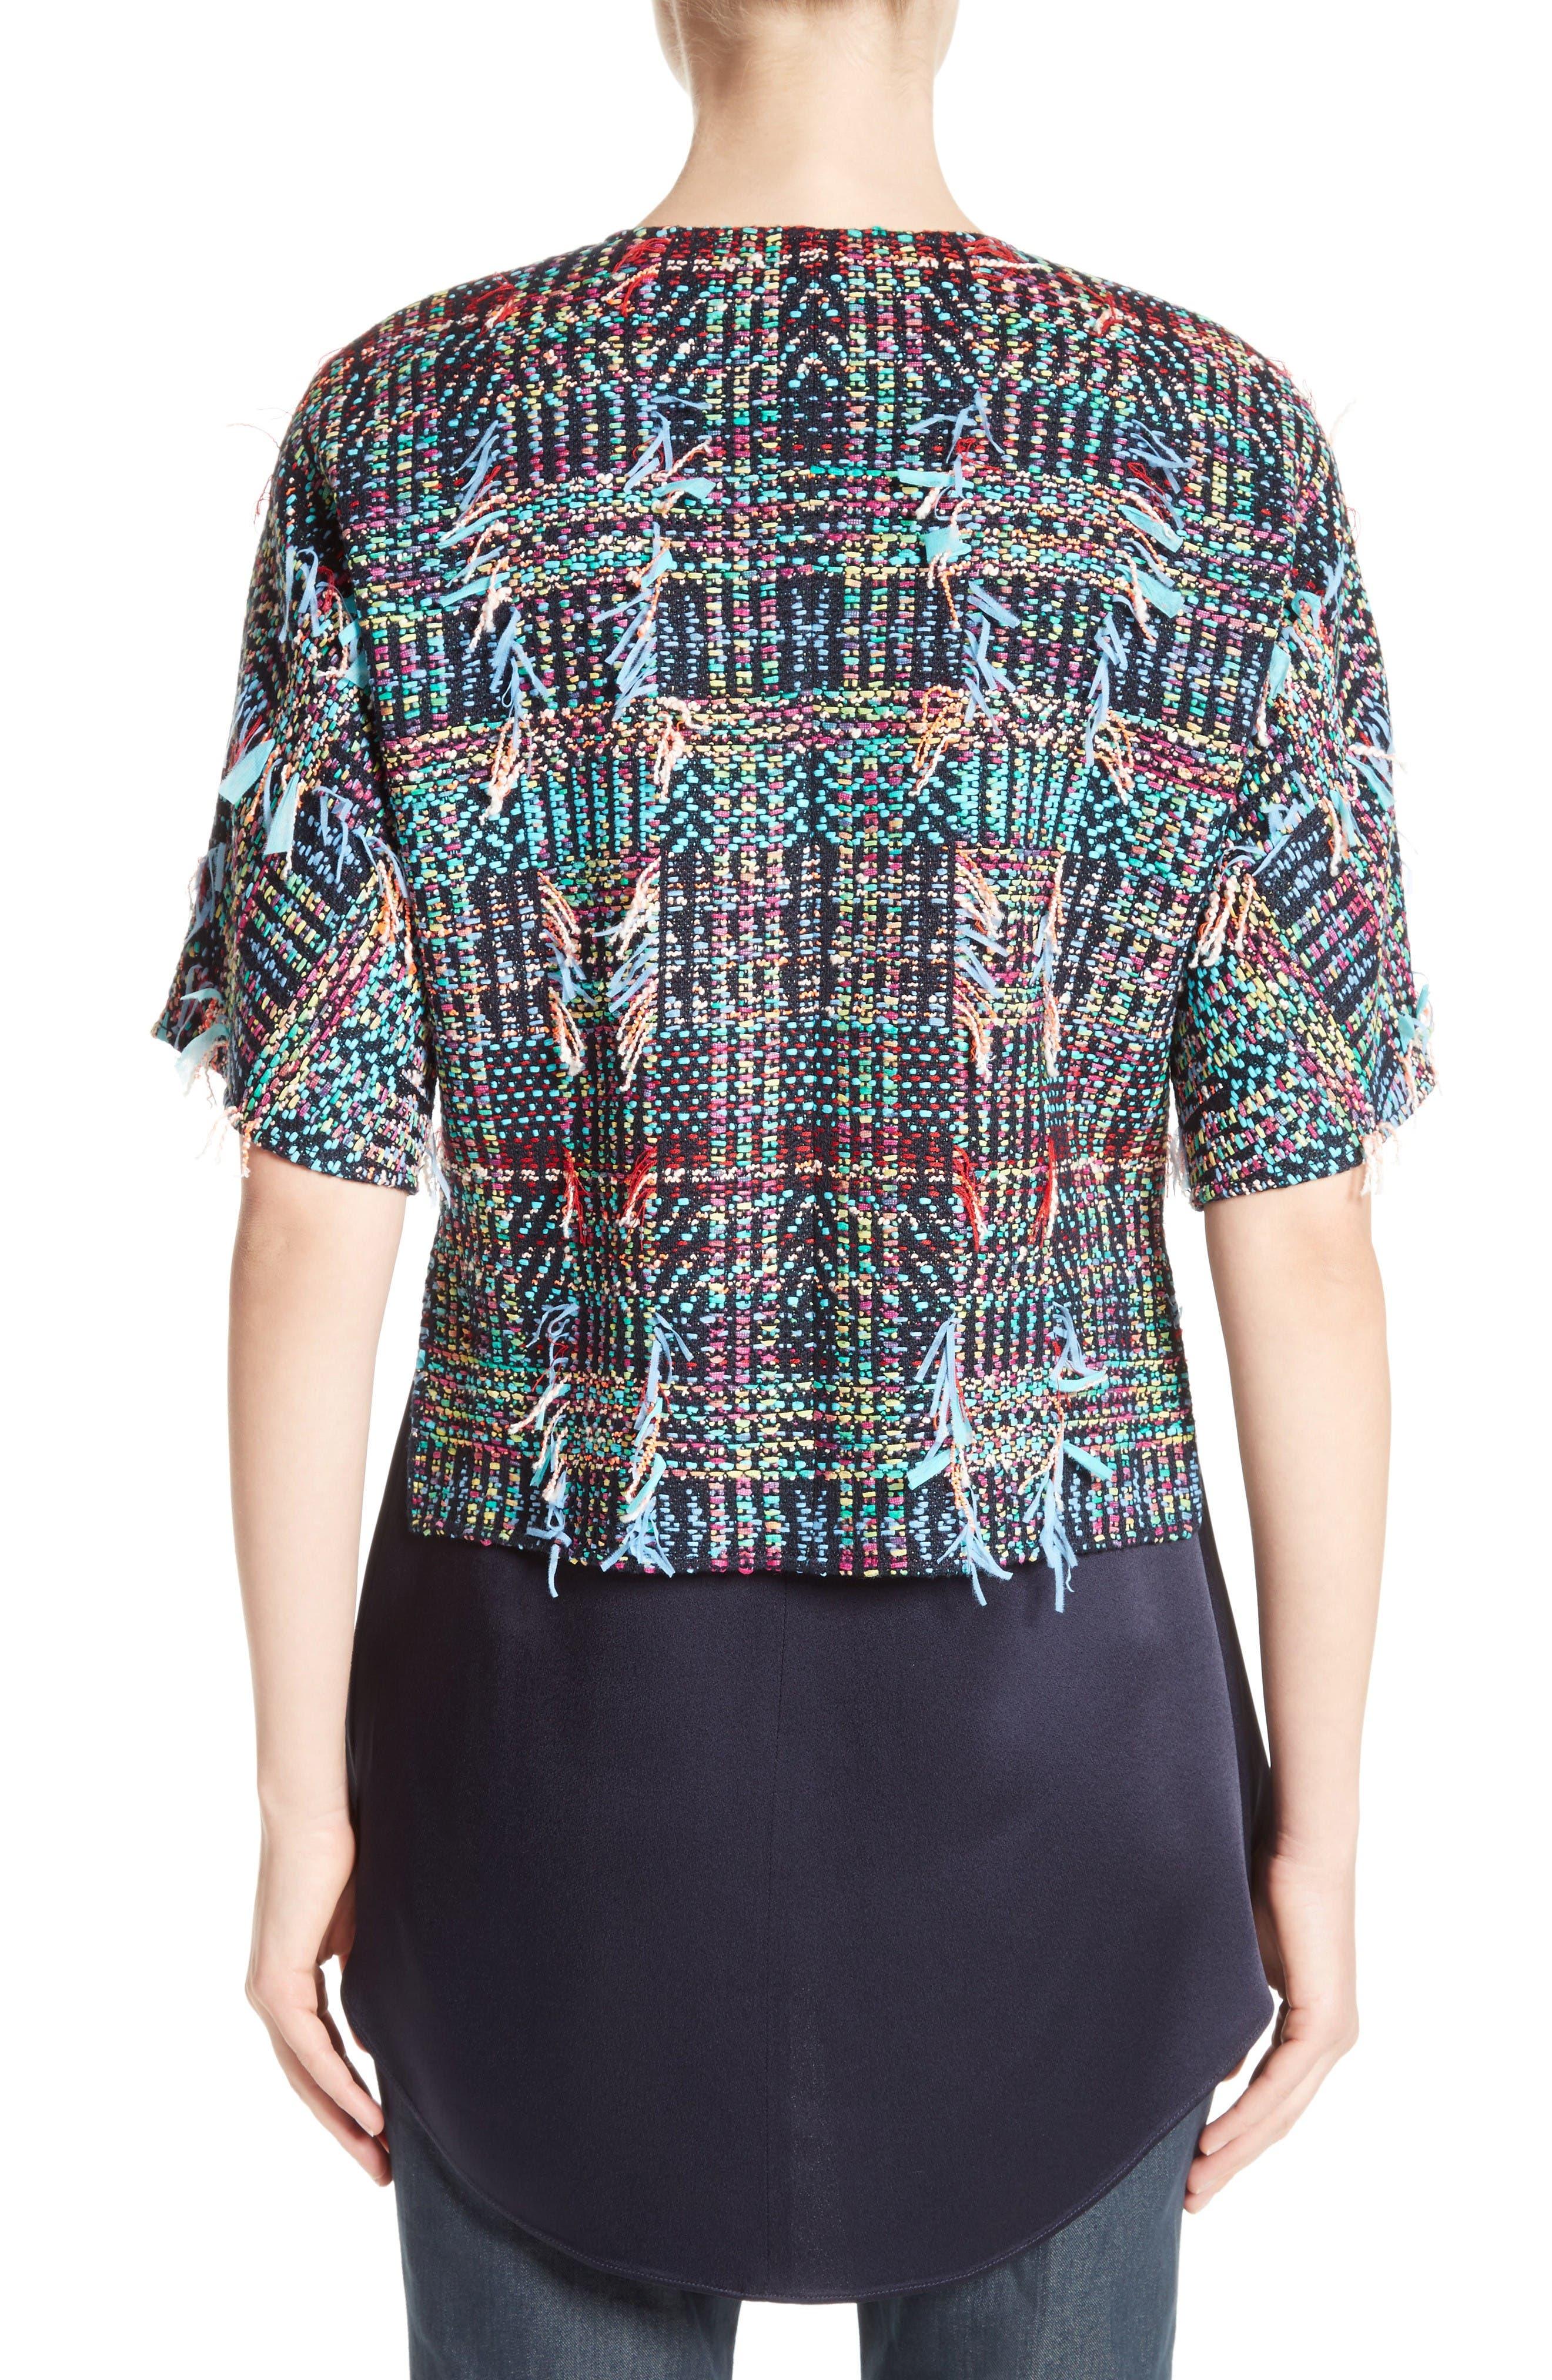 Dara Fringe Knit Jacket,                             Alternate thumbnail 2, color,                             Navy Multi